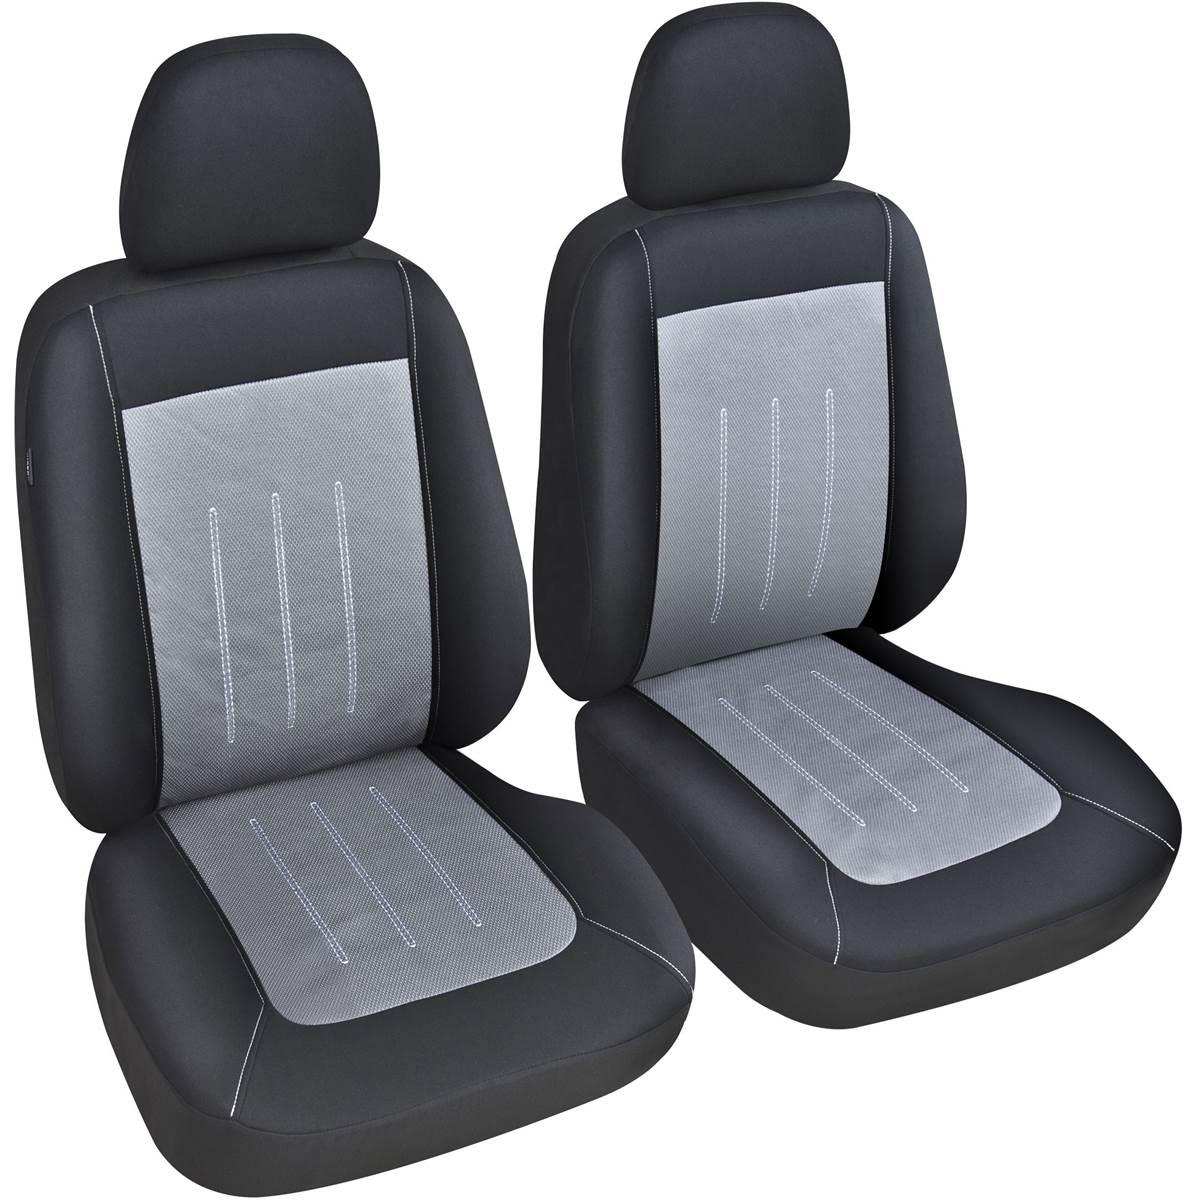 Ergoseat Oxford 910502 Car Seat Cover Grey